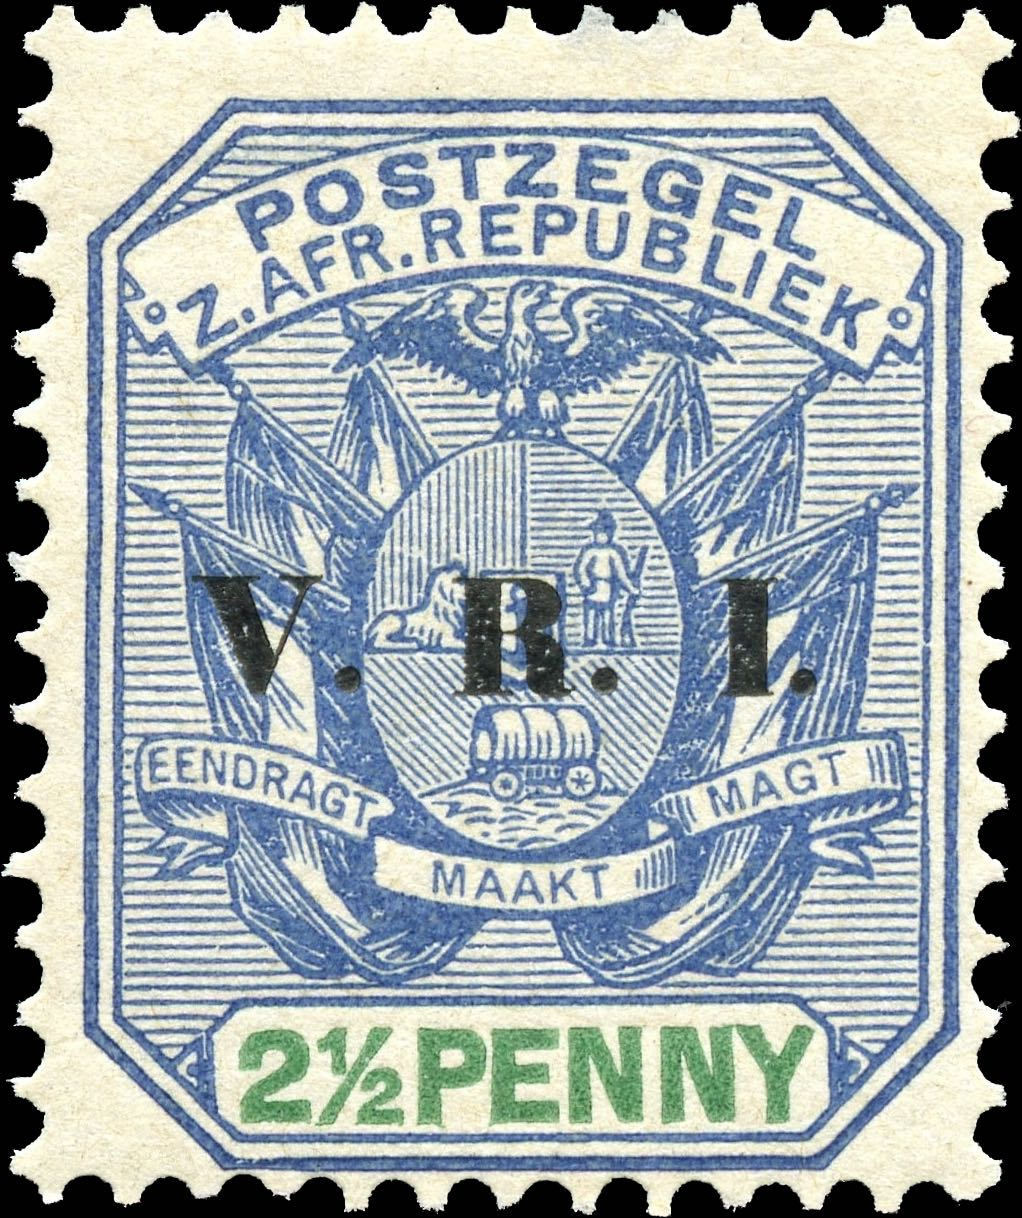 Transvaal_1900_2.5p_VRI_Overprint_Reprint